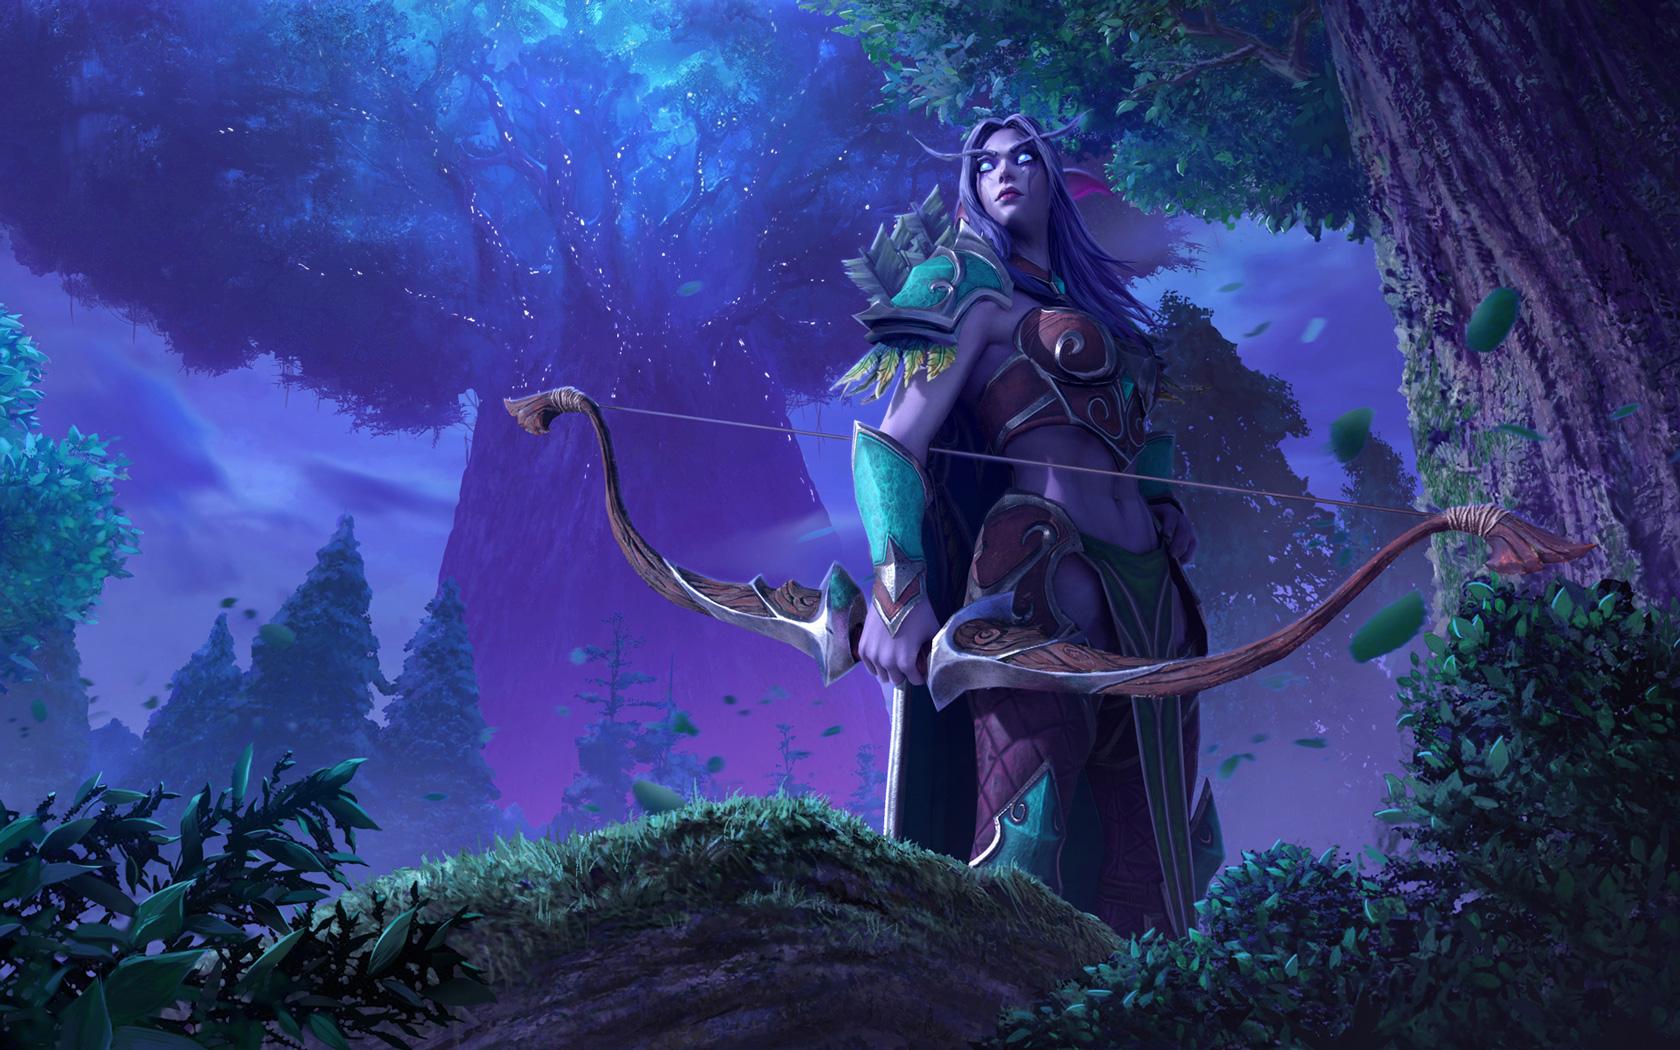 Free Warcraft III Wallpaper in 1680x1050